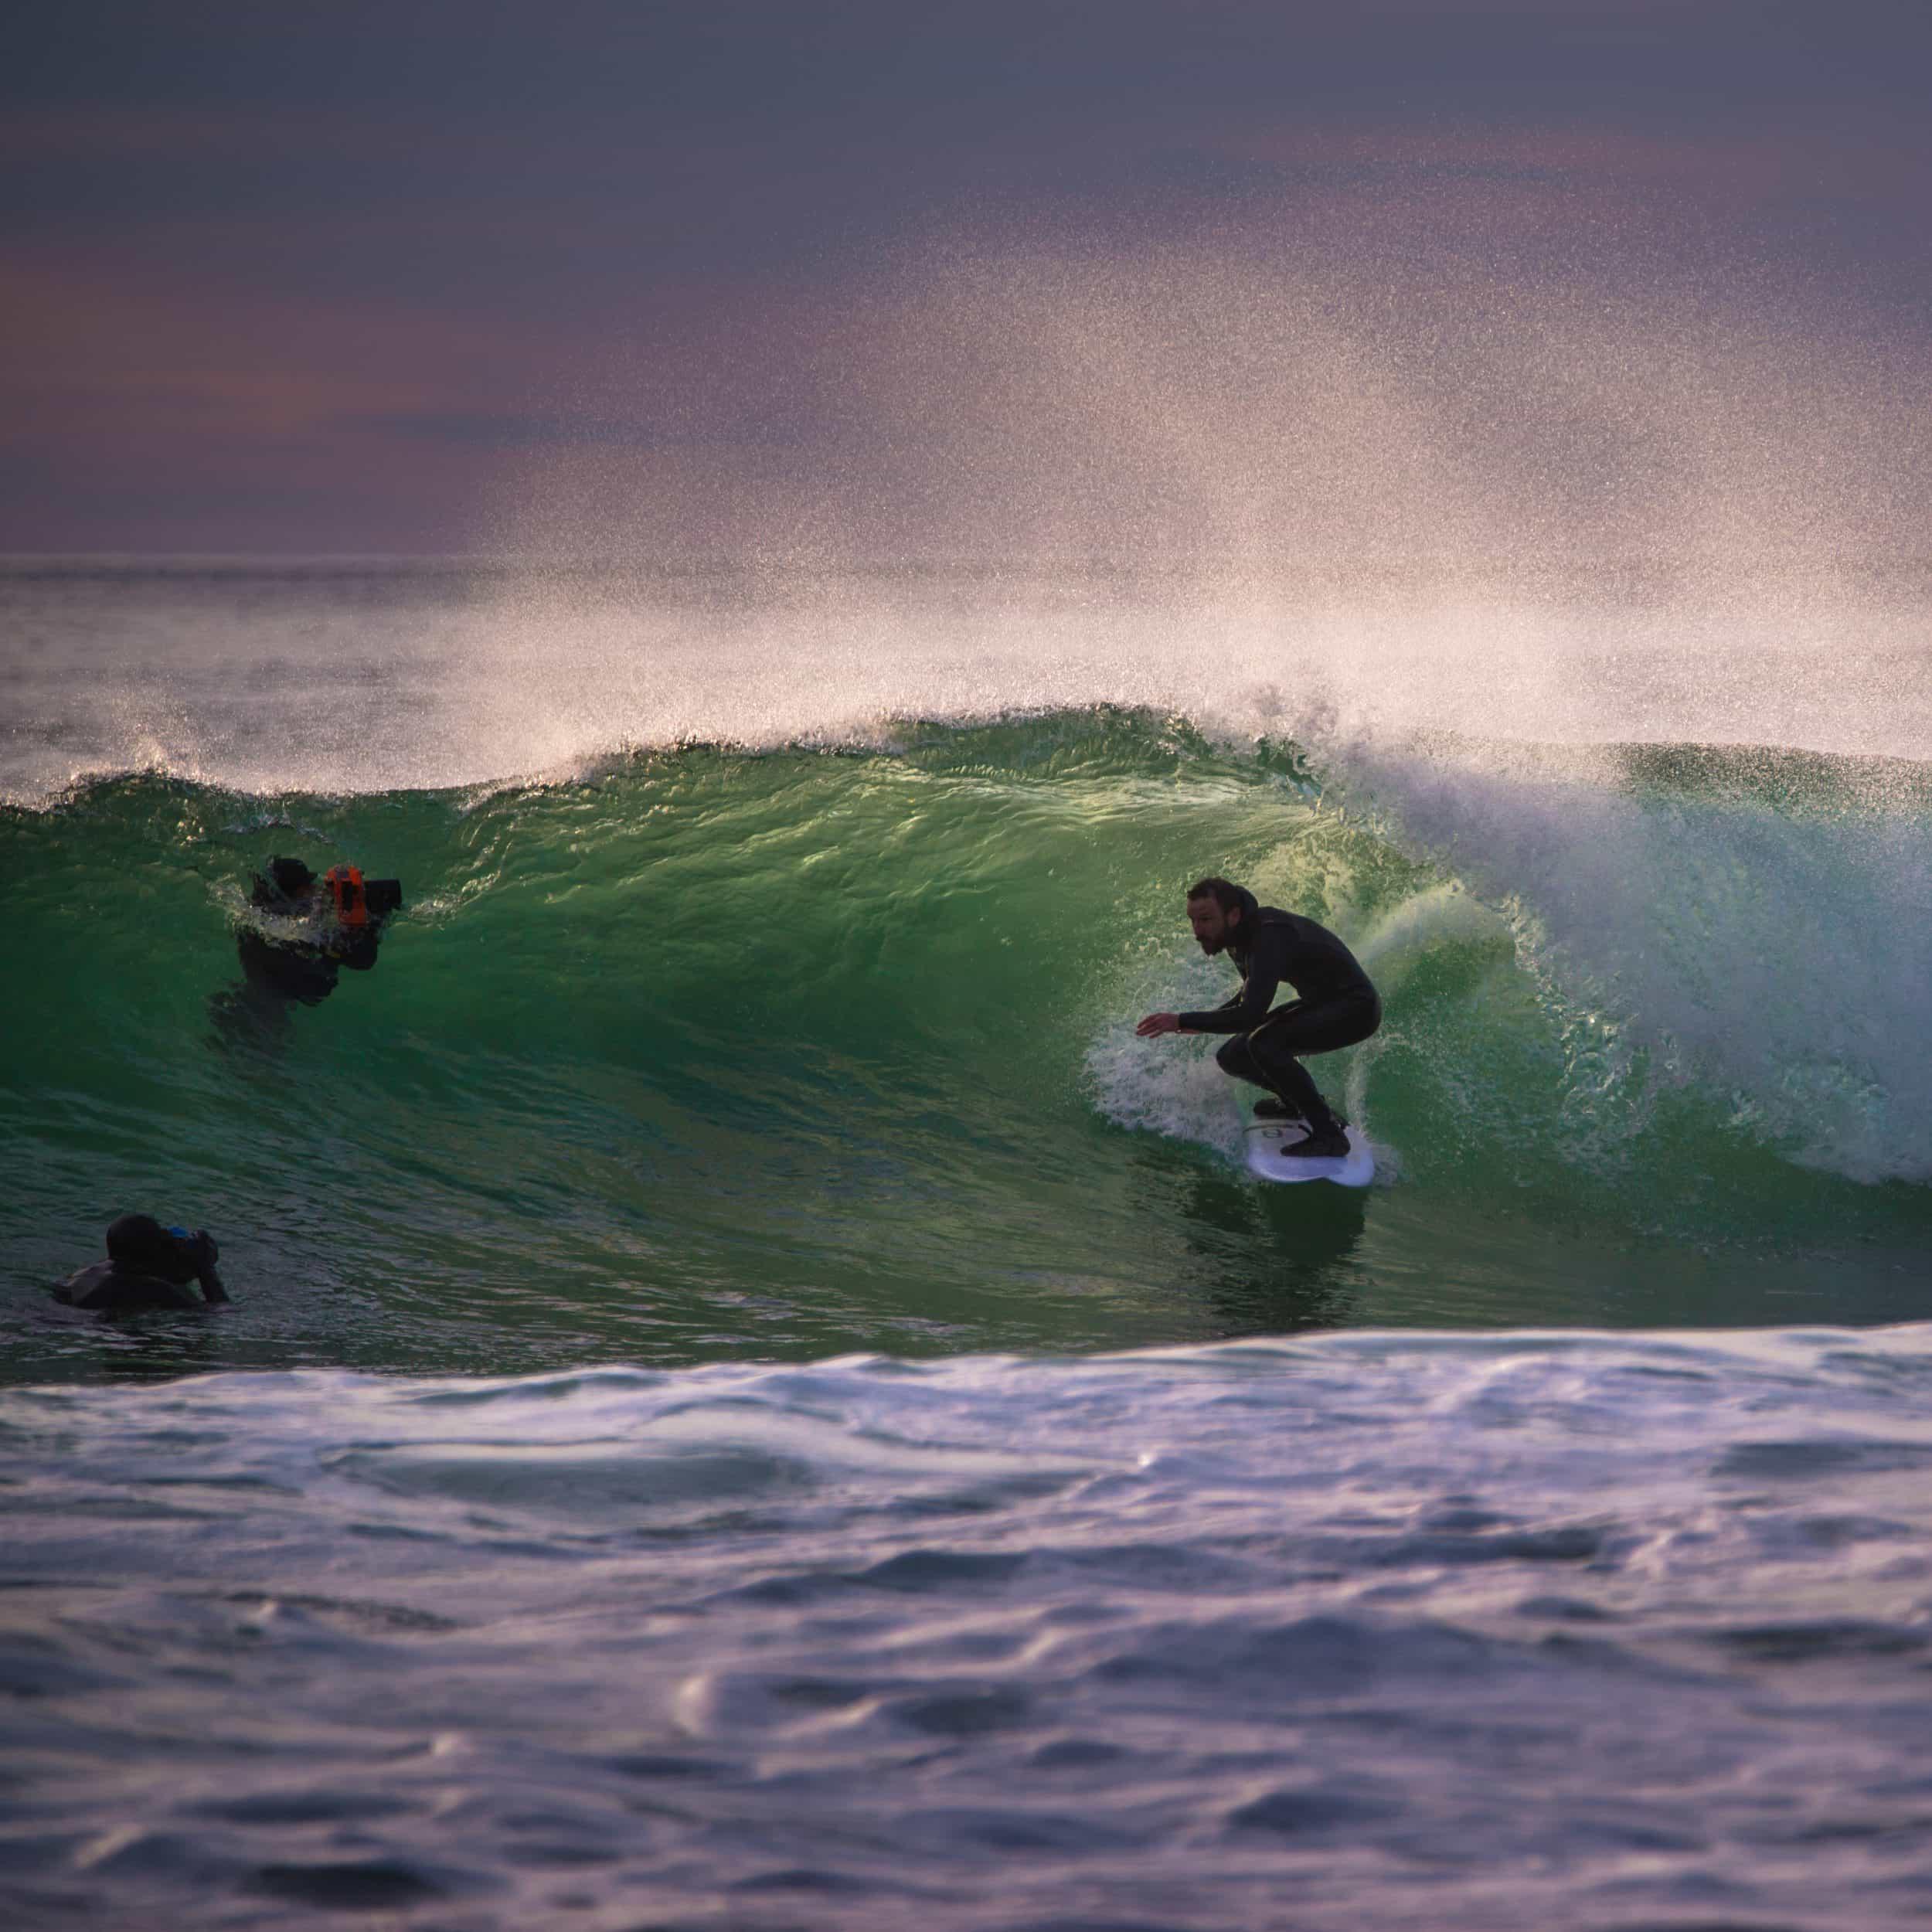 Andreas Wolden - 05.09.17,Unstad. Surfer Jean-Baptiste Debure